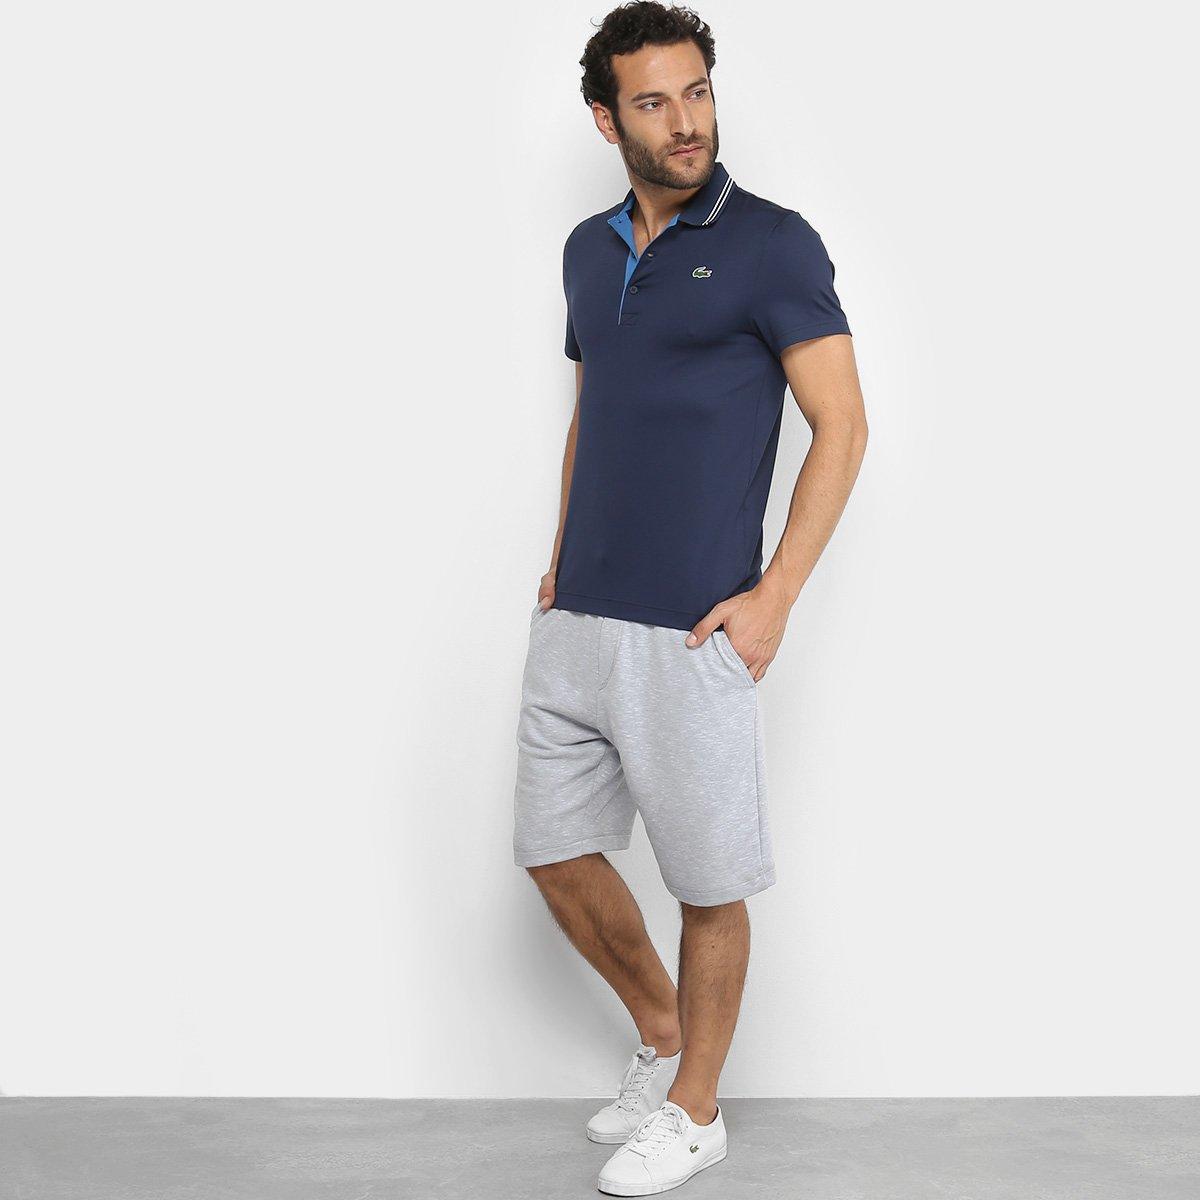 Camisa Polo Lacoste Golf Sport Strech Masculina - Marinho e Azul ... 23fc439a5a4a1